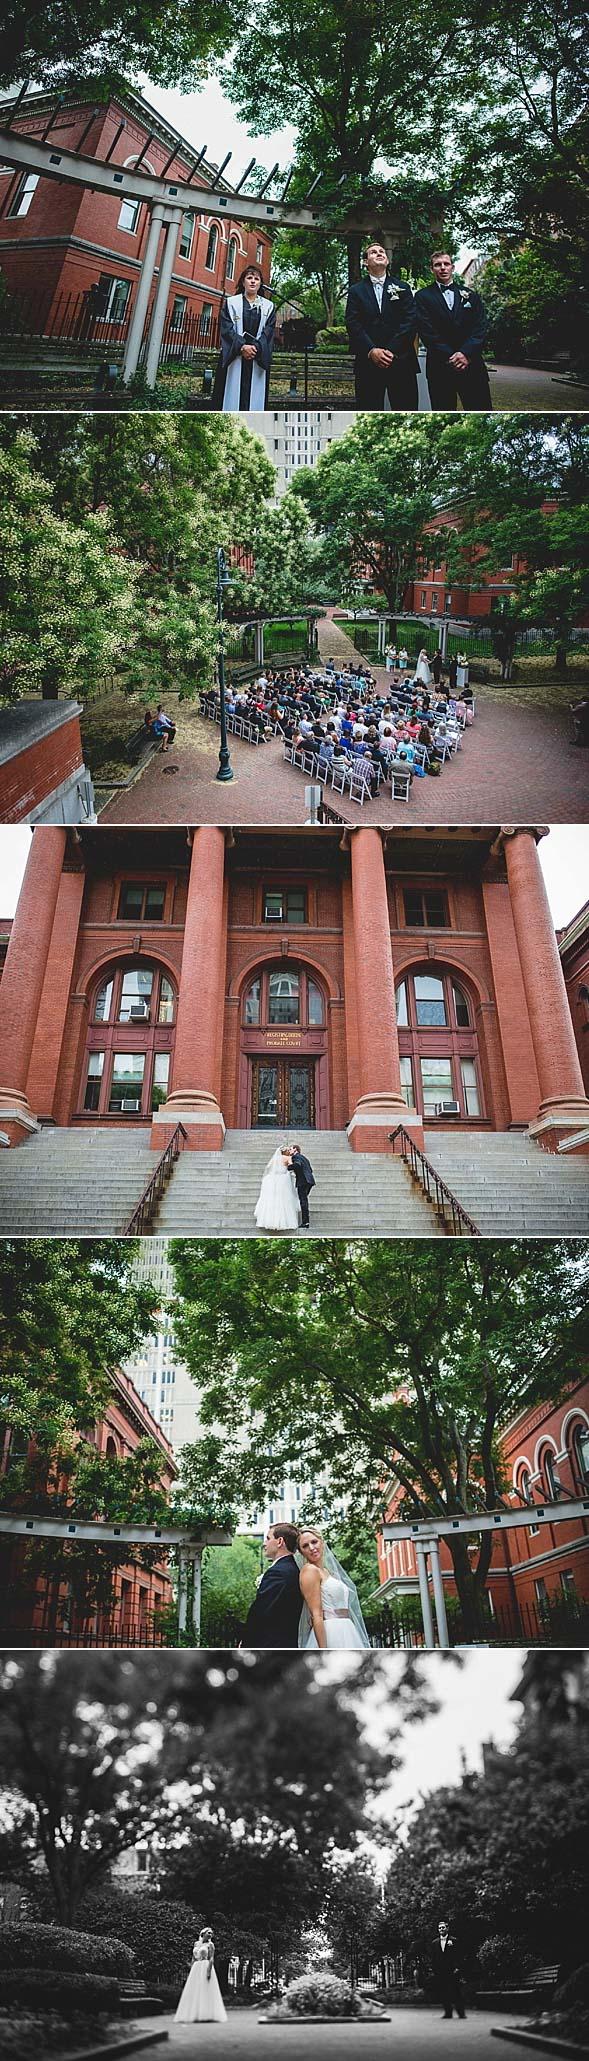 Multicultural Arts Center Wedding-1.jpg